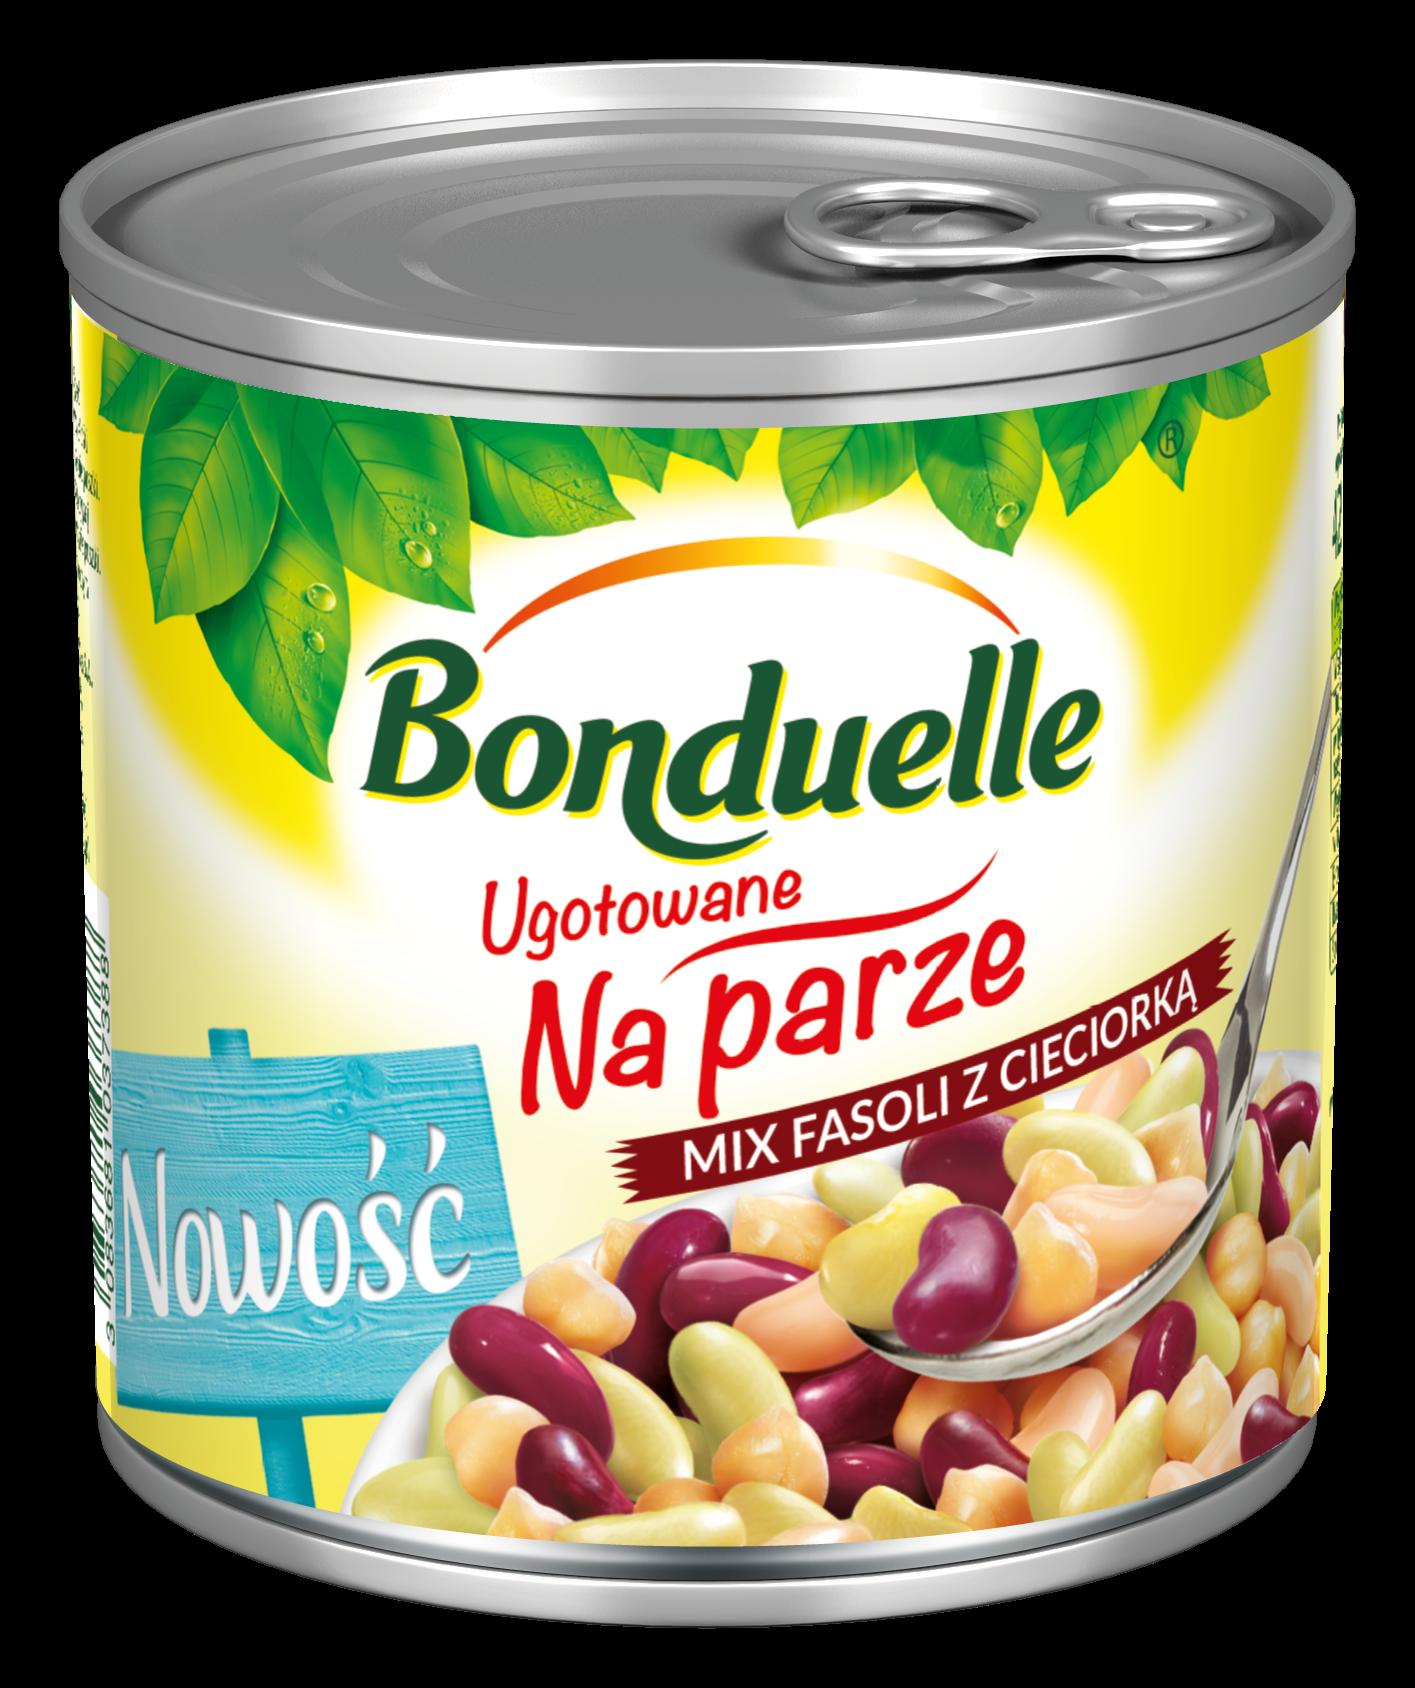 Kampania telewizyjna i digital marki Bonduelle